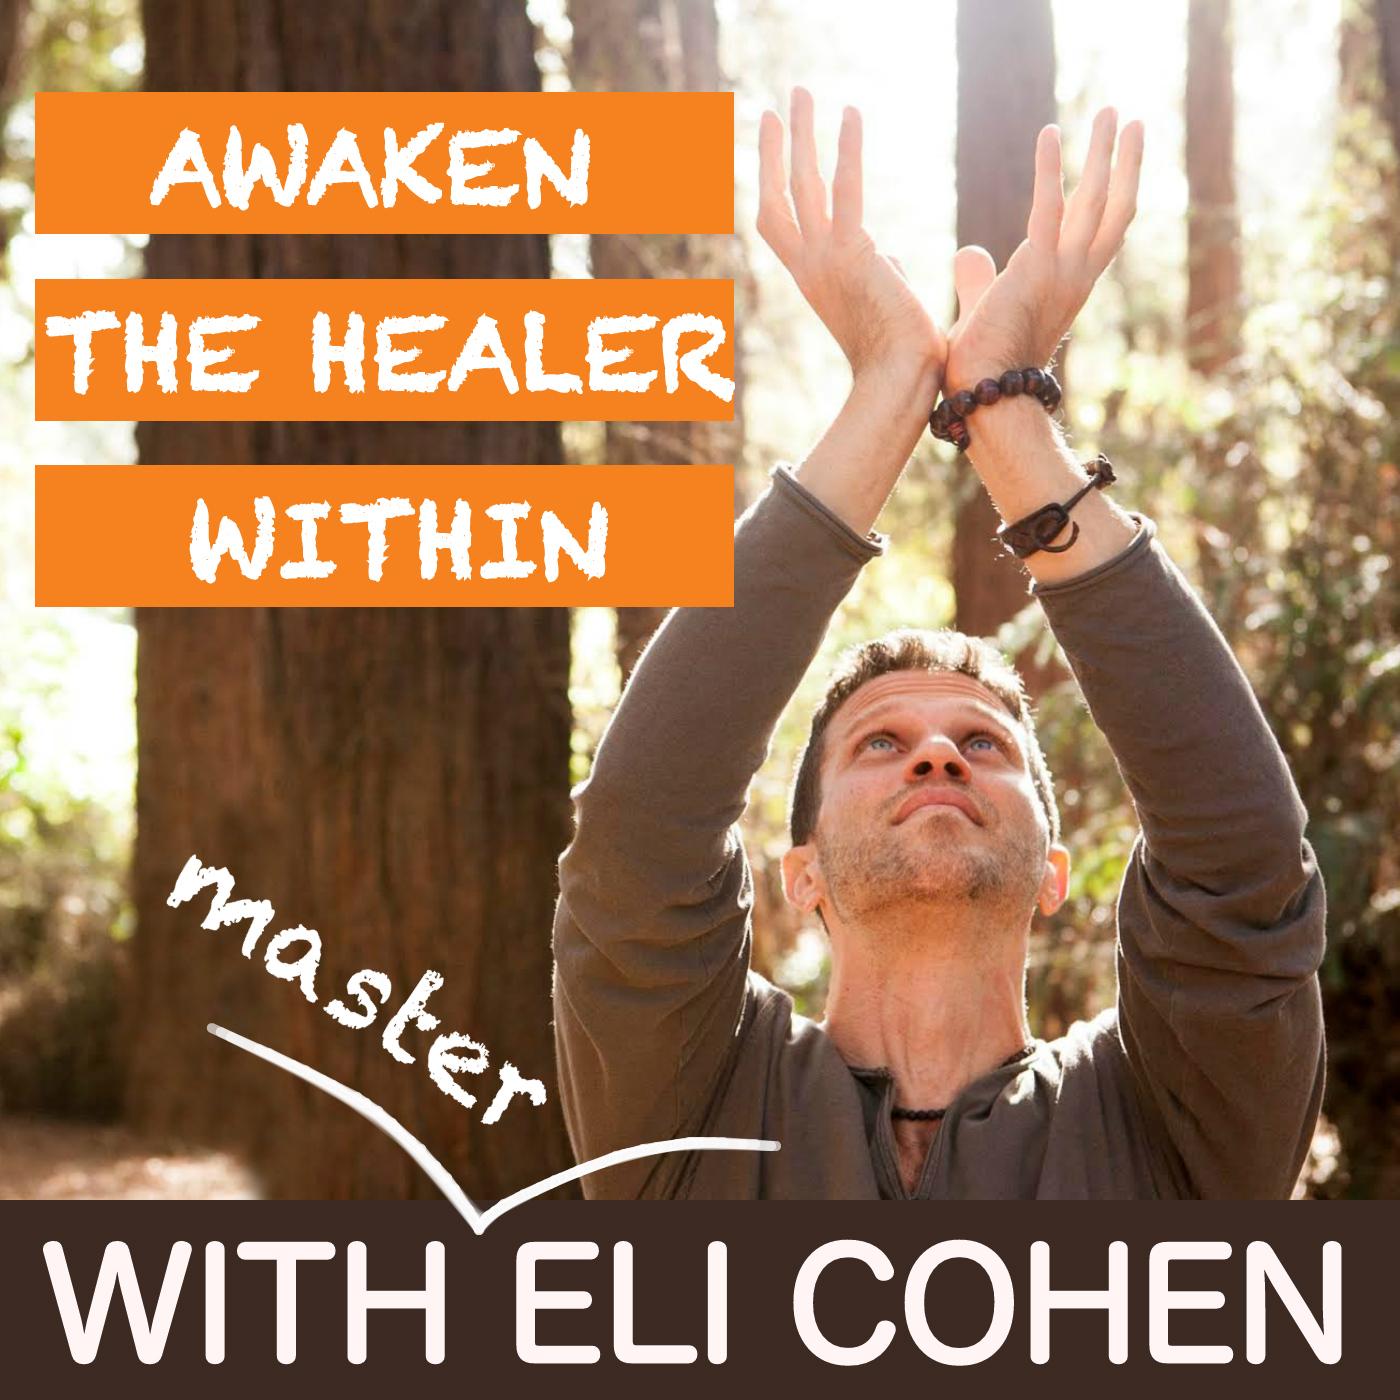 Awaken The Healer Within - Qi With Eli